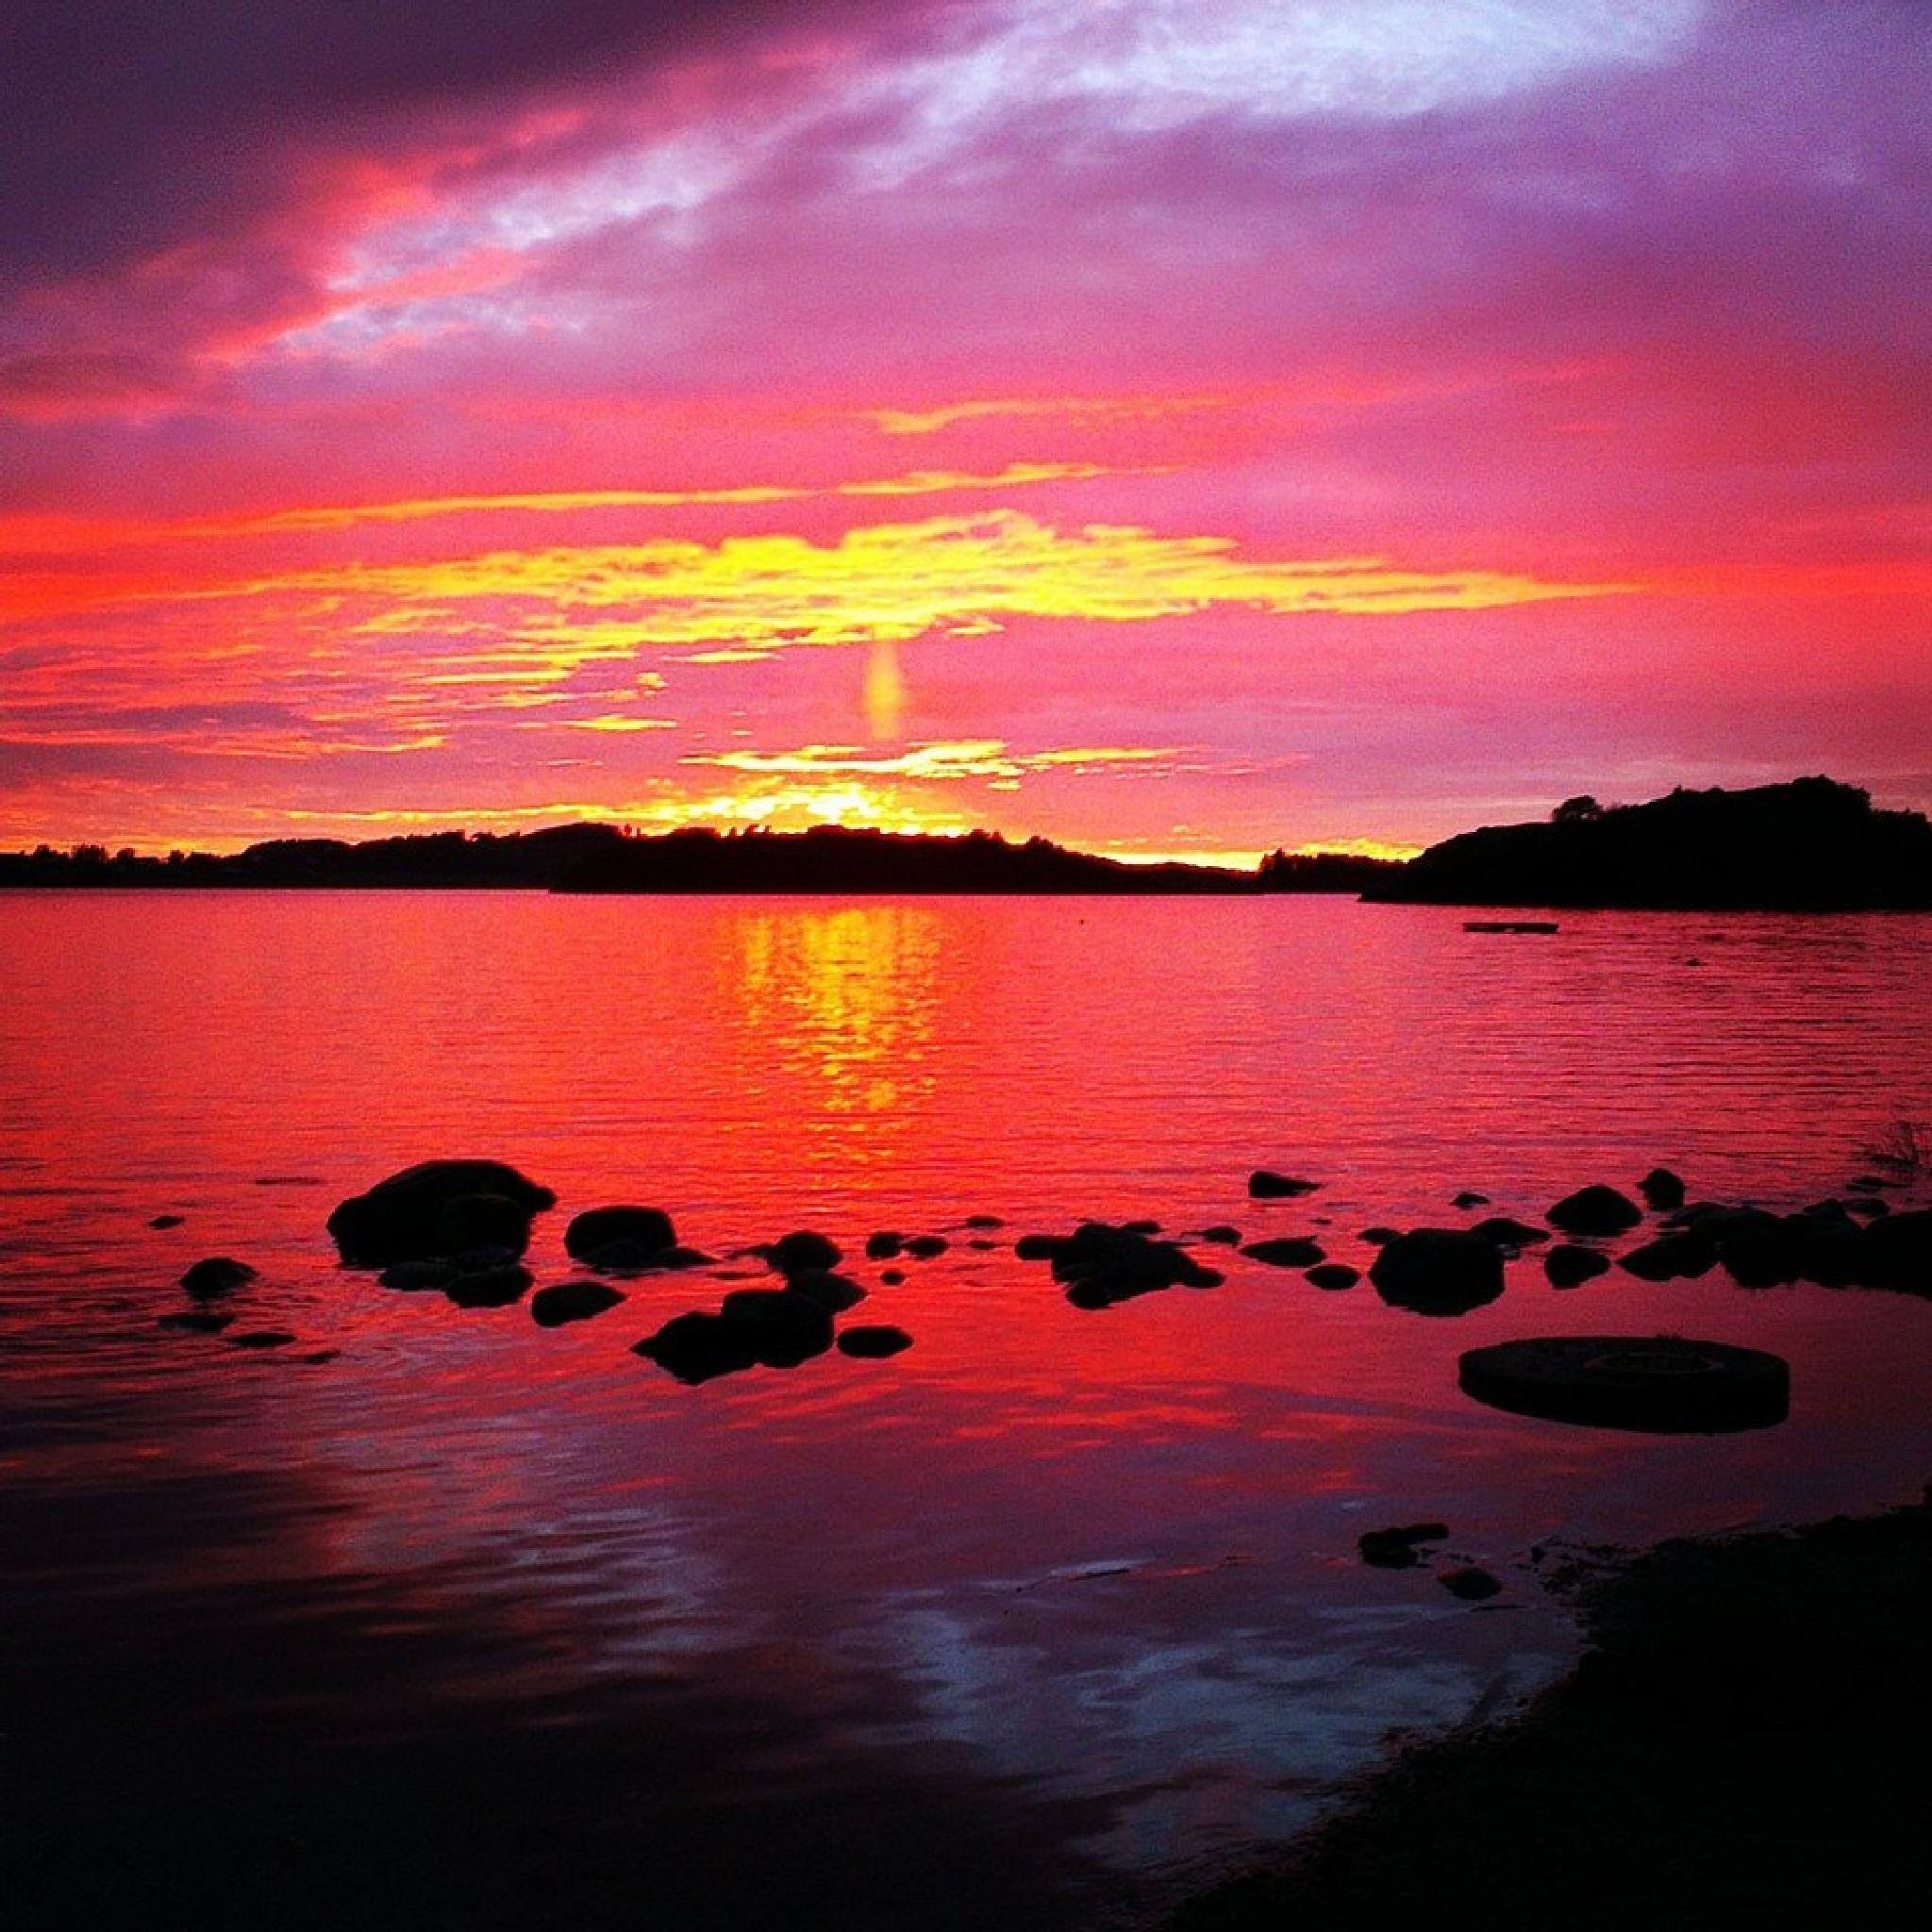 Pink sunset by kfolst